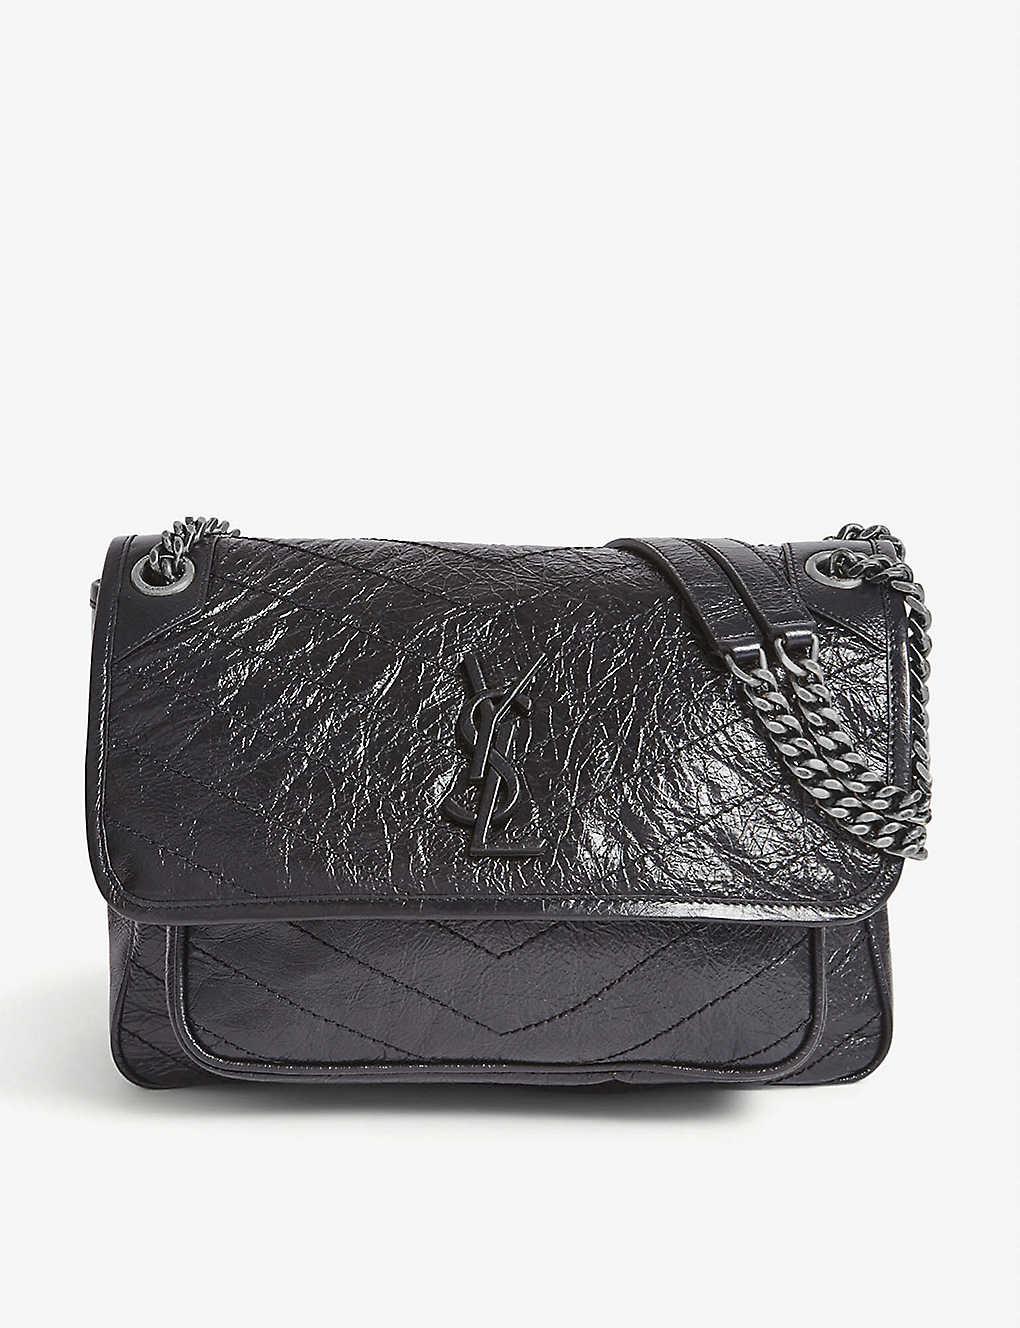 SAINT LAURENT: Medium Monogram Niki leather cross-body bag